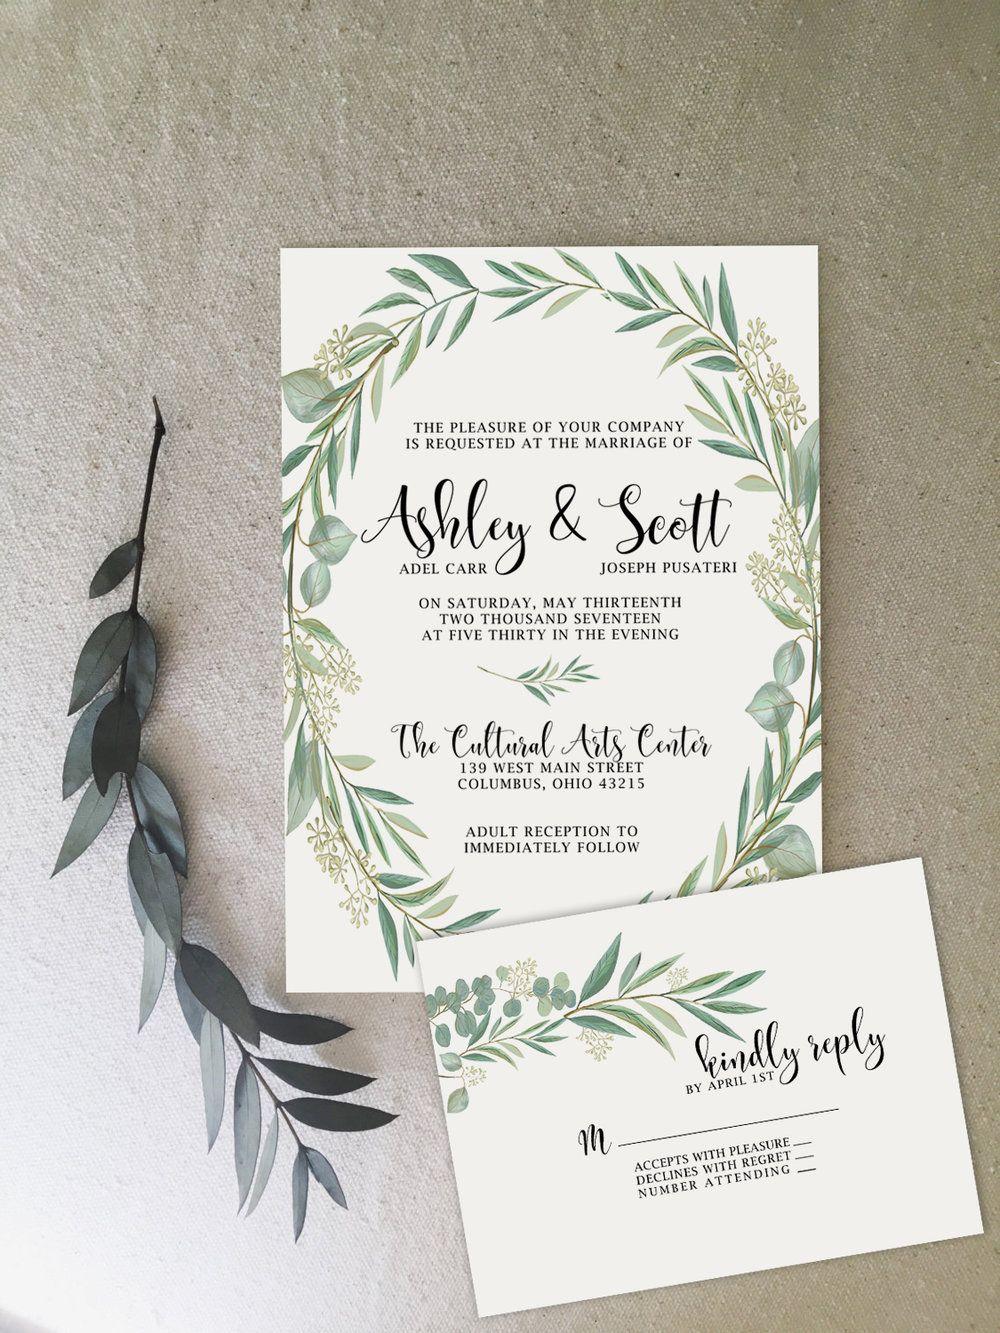 Whimsical simple greenery wedding invitations by @Unicaforma_ ...